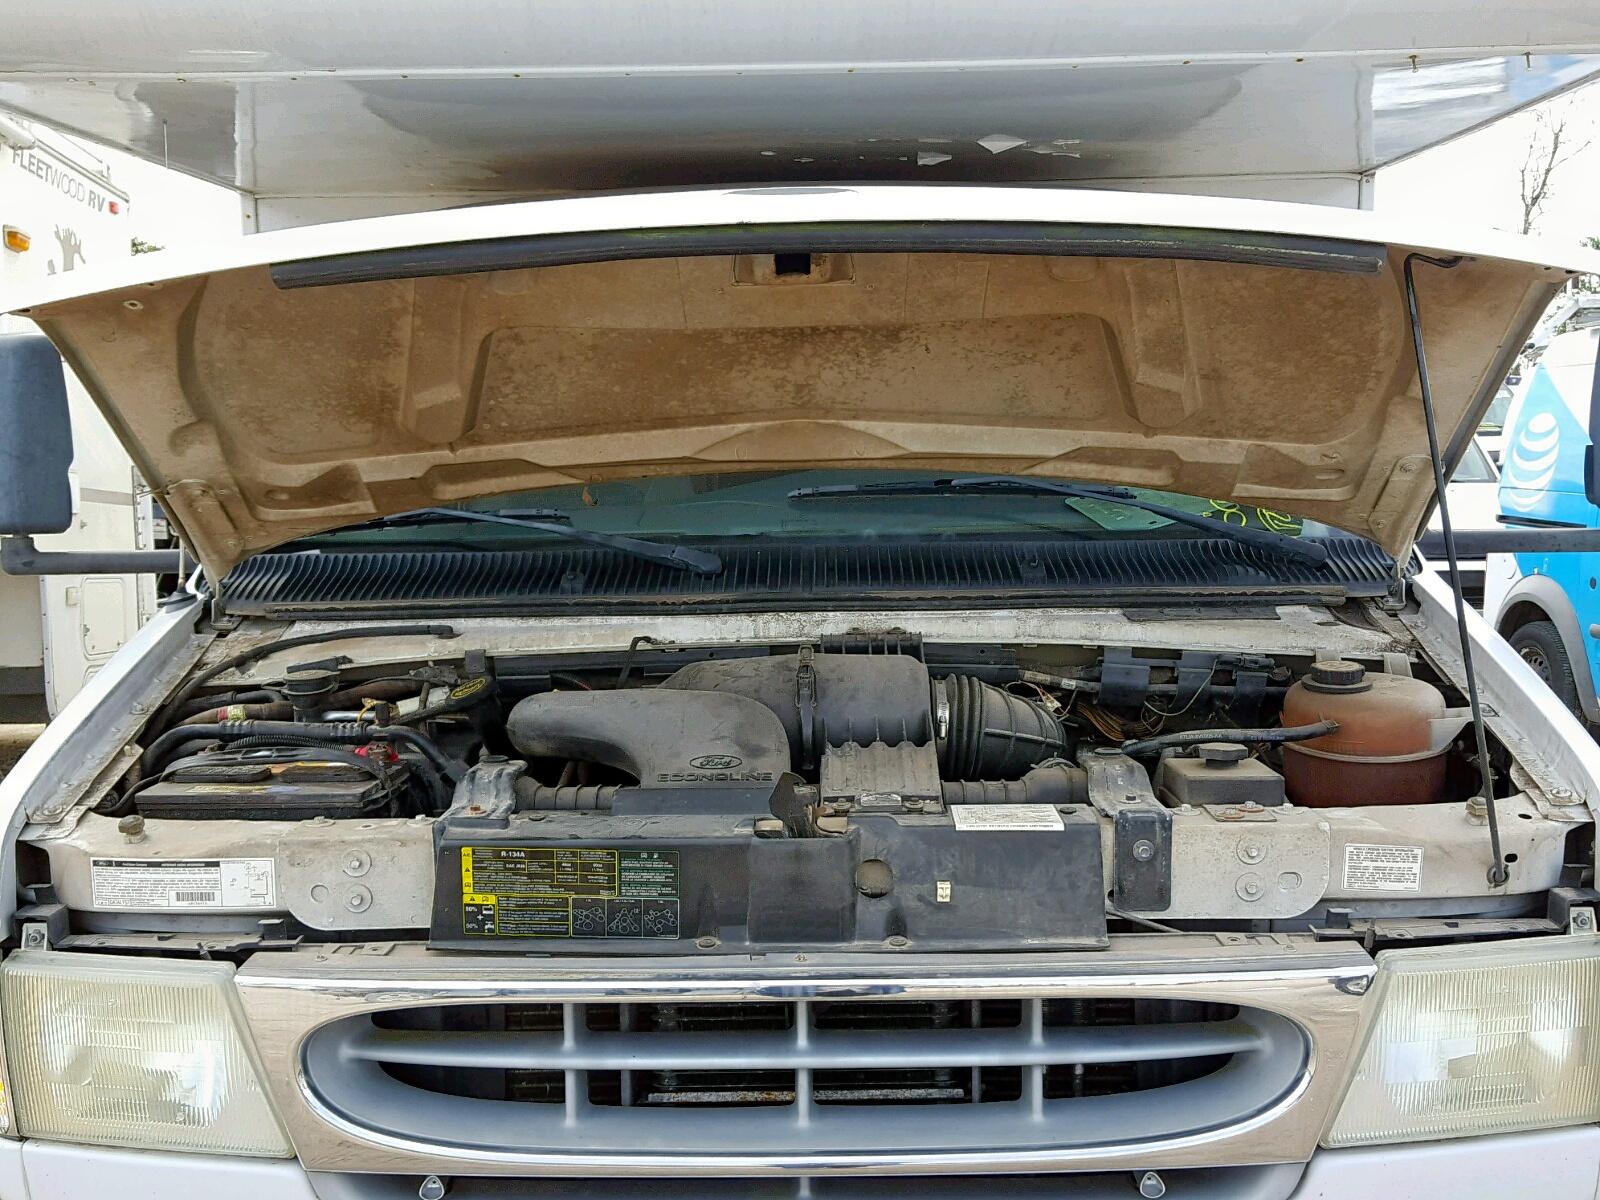 hight resolution of  1fdxe45s82ha94971 2003 ford e450 rv 6 8l inside view 1fdxe45s82ha94971